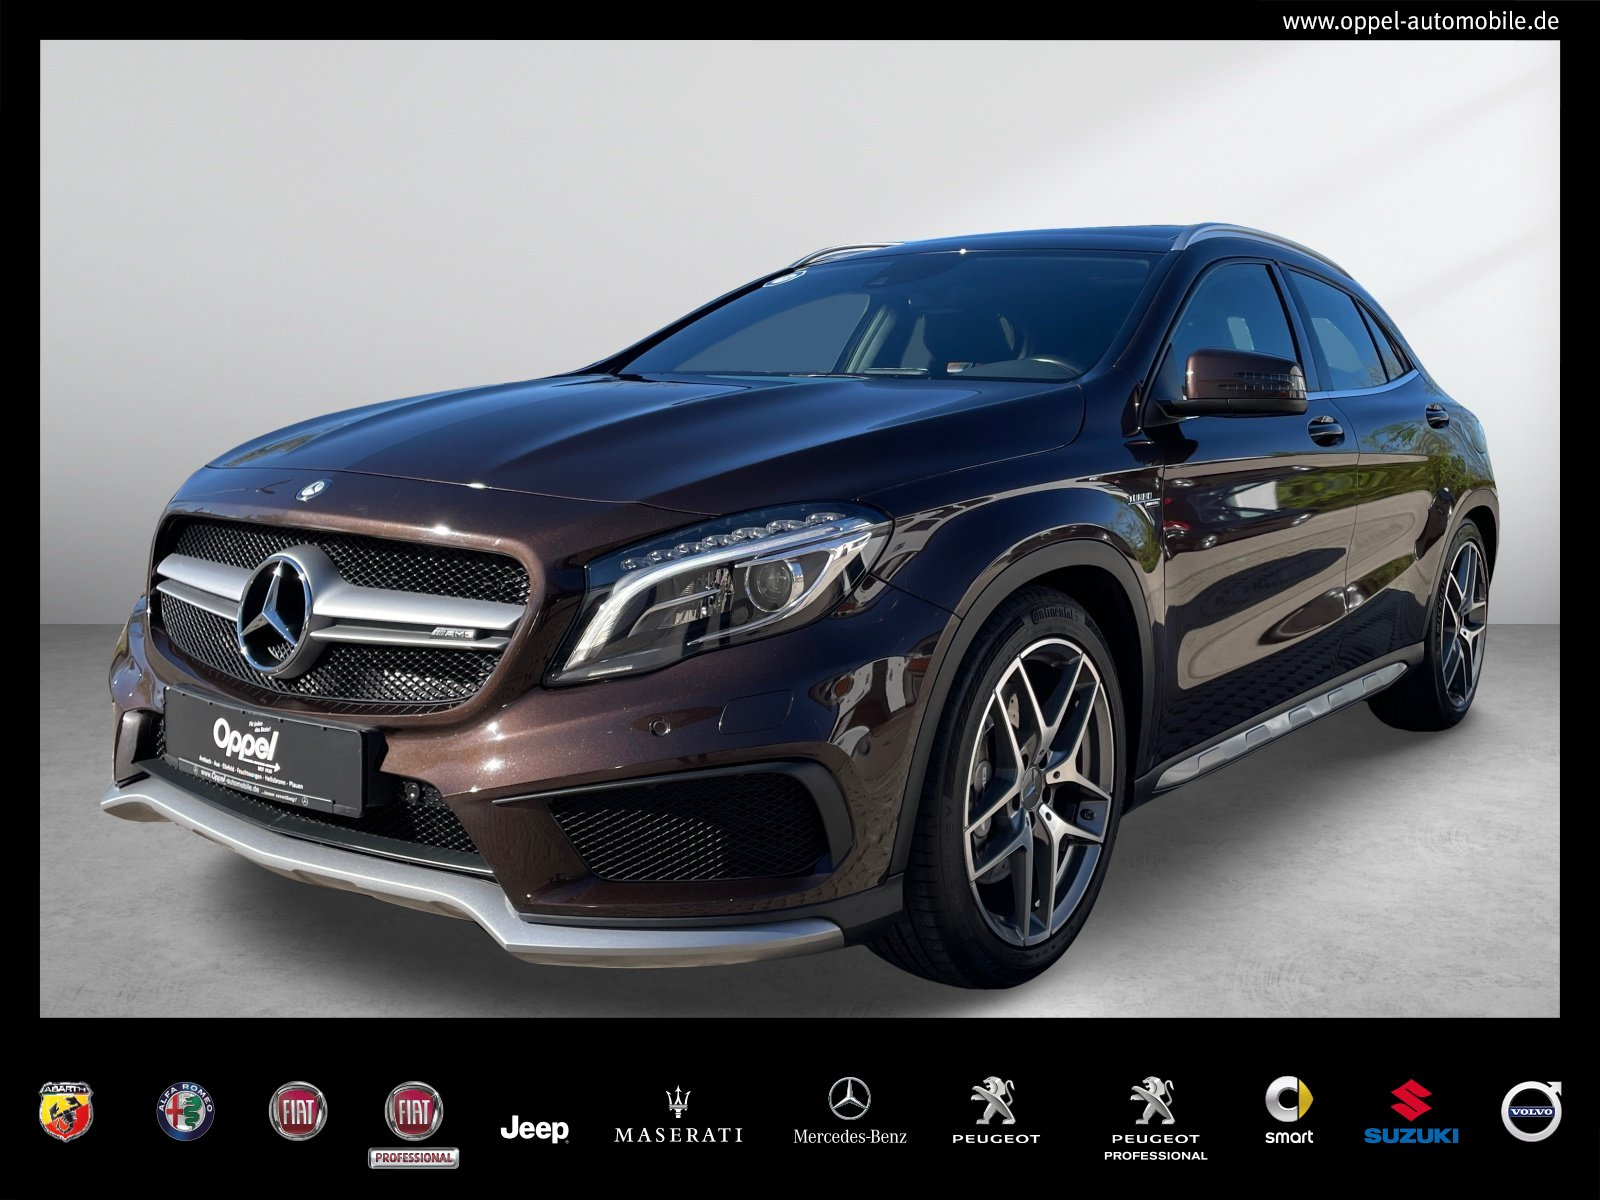 Mercedes-Benz GLA 45 AMG 4MATIC PANO+LED+COMAND+R-KAMERA+NAVI, Jahr 2015, Benzin